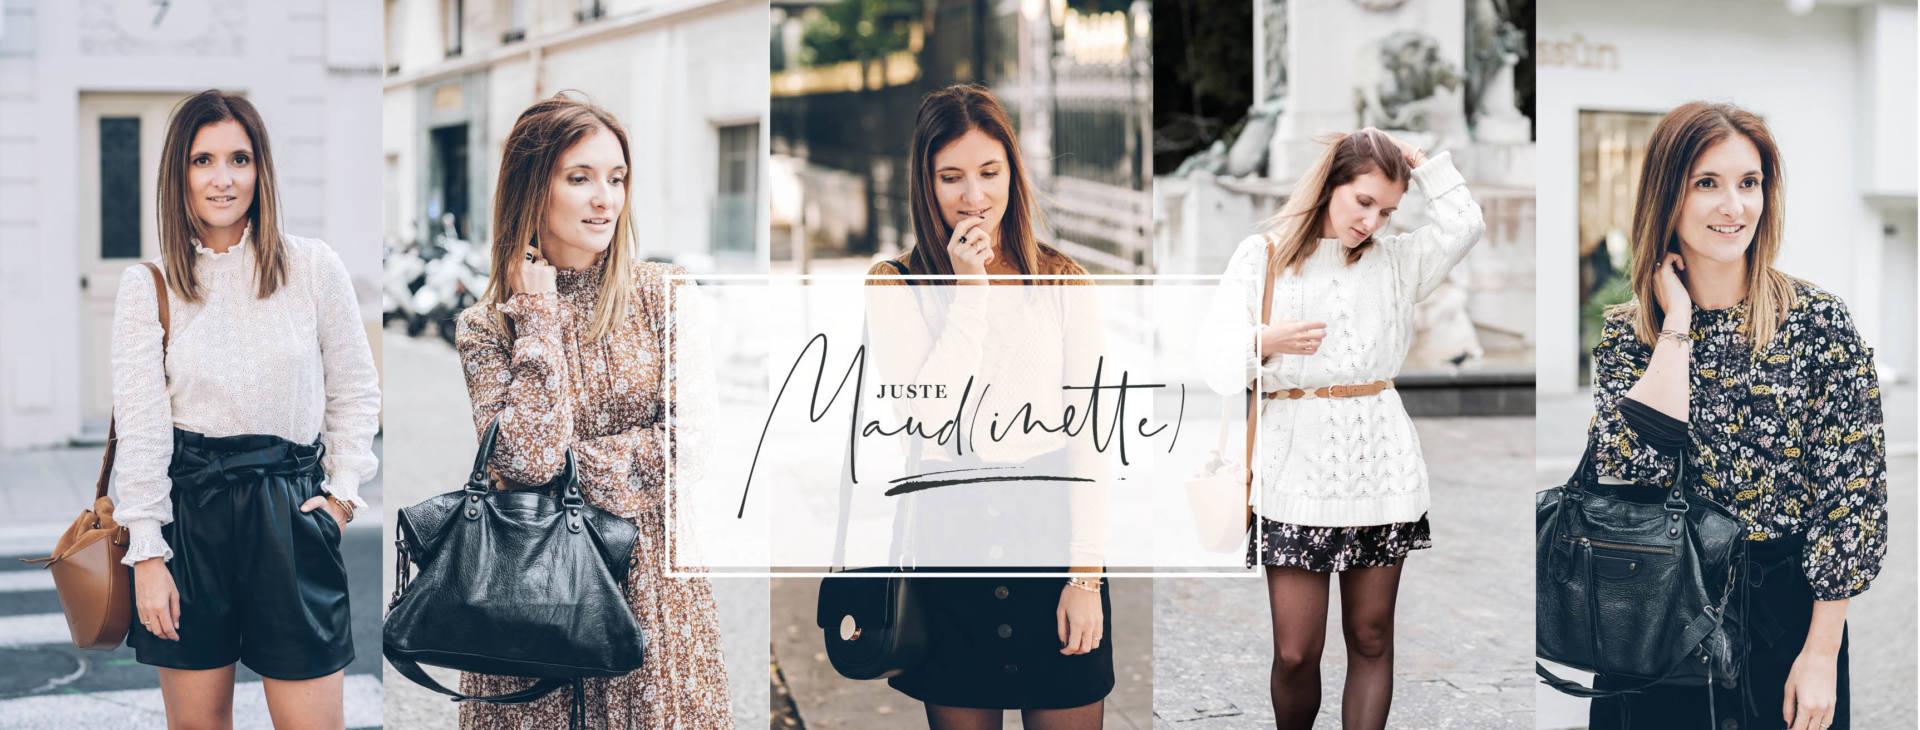 Juste Maudinette